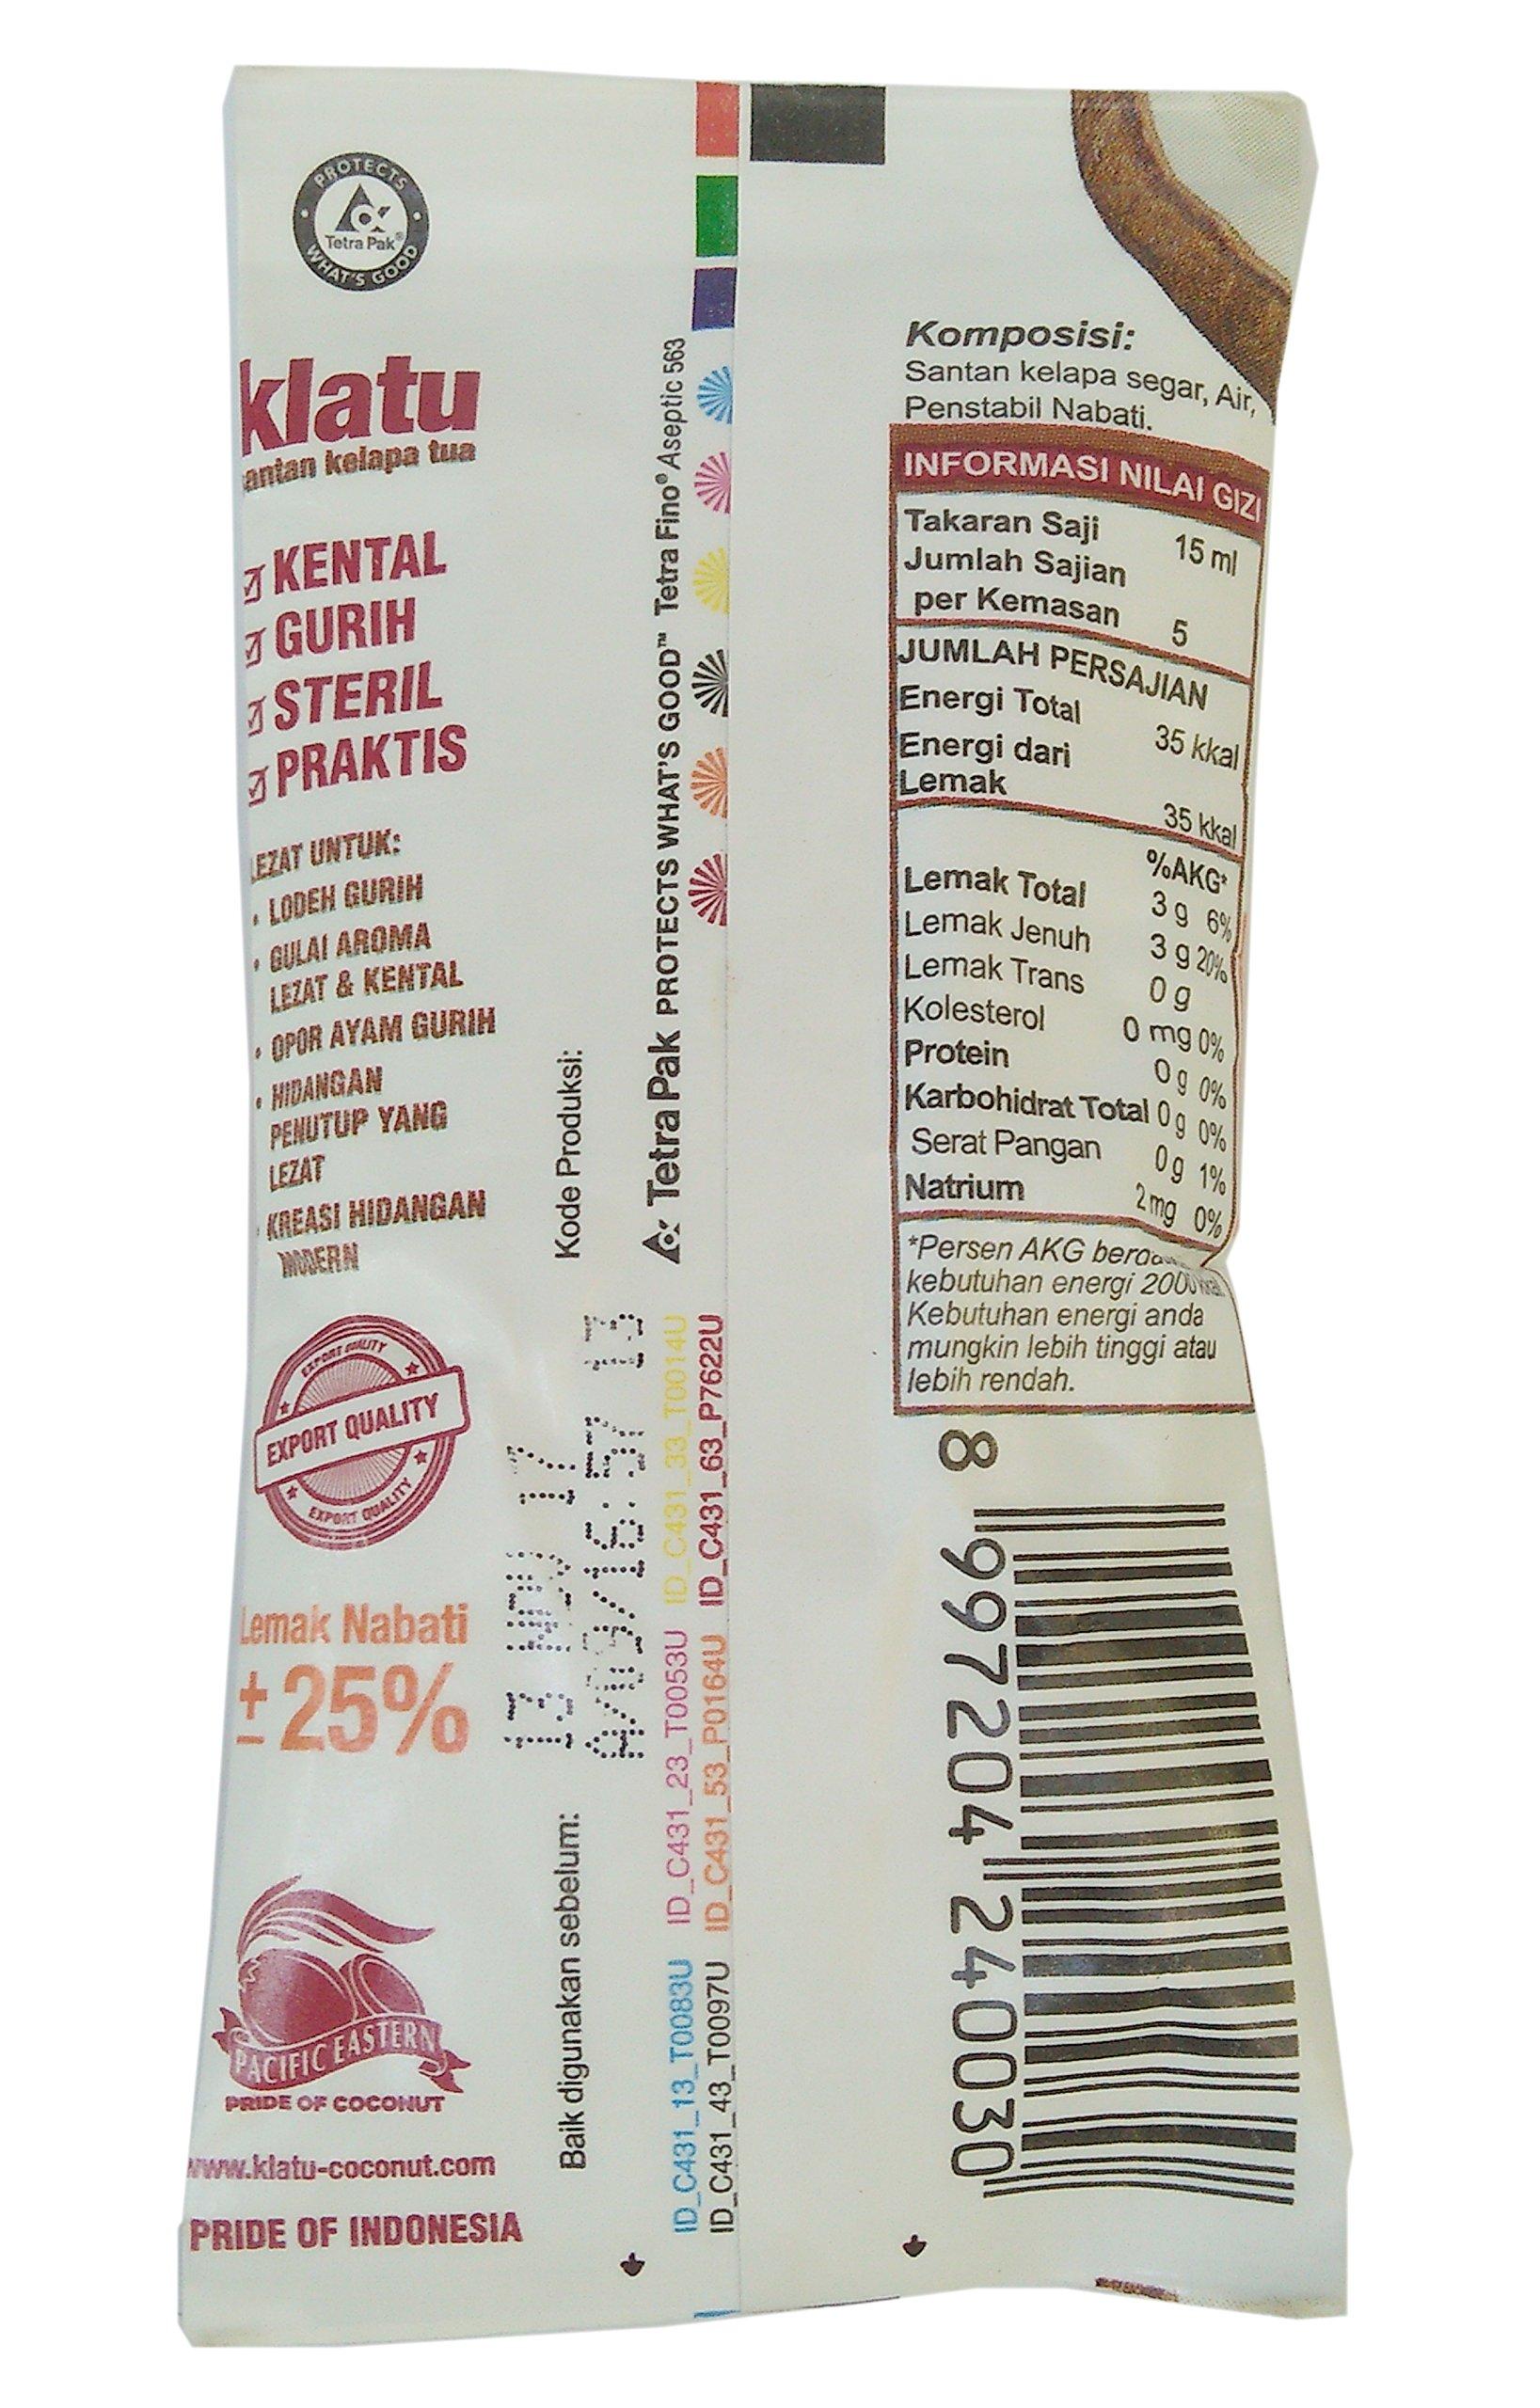 Klatu Santan Kelapa Tua - Coconut Cream Powder, 70ml (Pack of 36) by Klatu (Image #2)